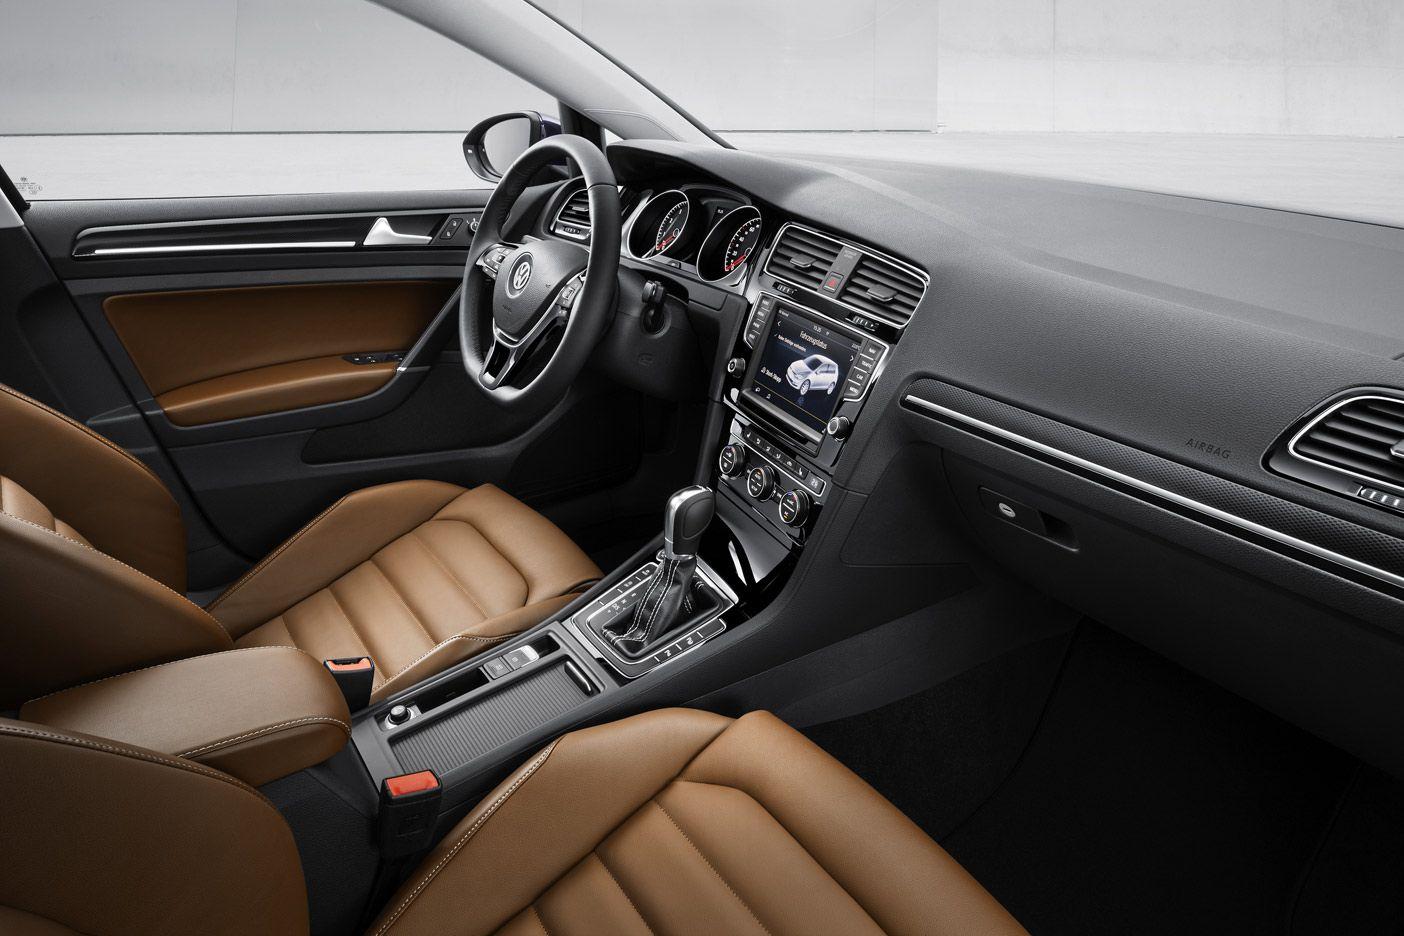 Volkswagen Golf 7 - Interior. | Cars | Pinterest